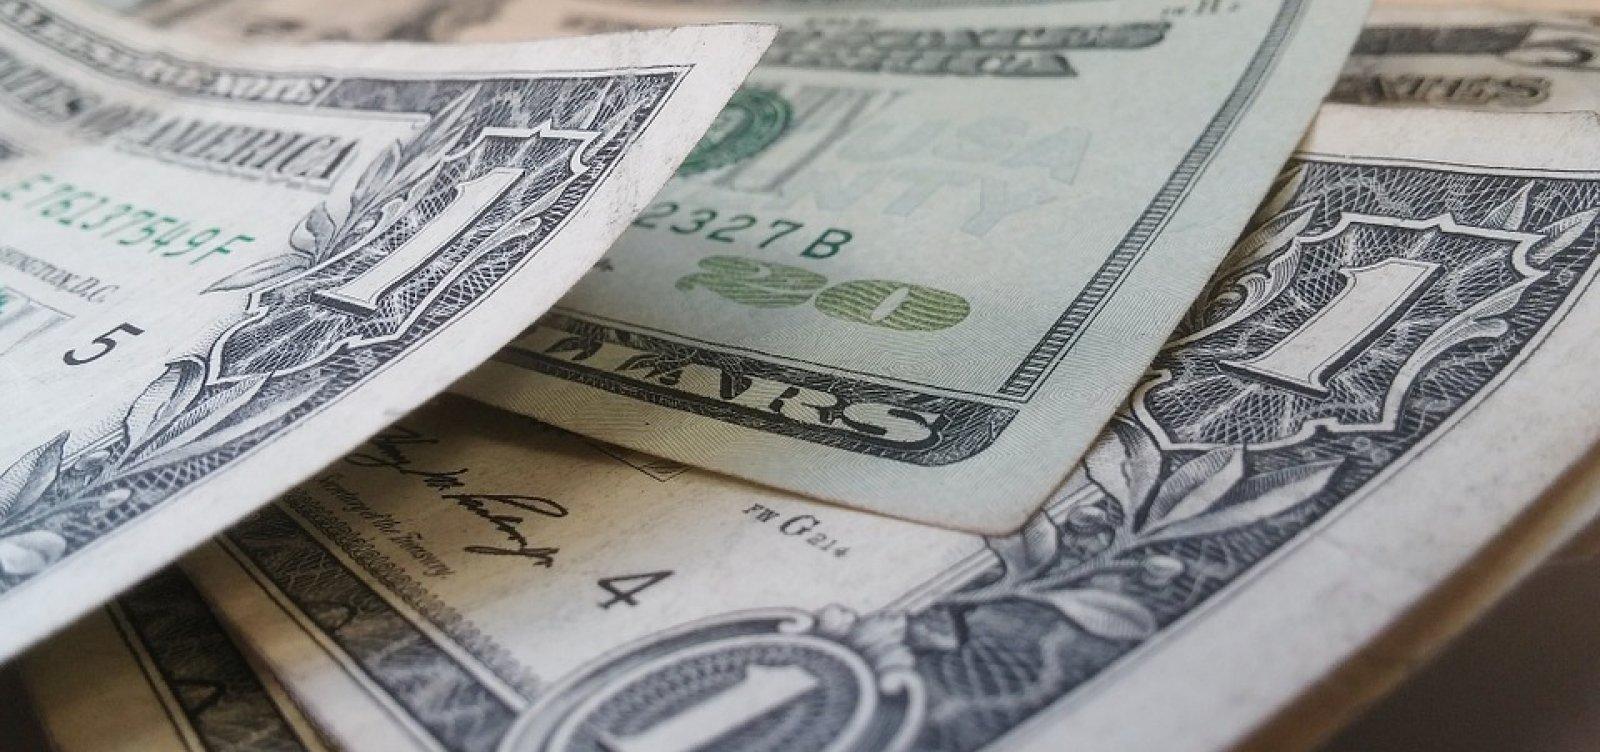 Dólar fecha em queda de 0,65% com otimismo global sobre vacina para Covid-19